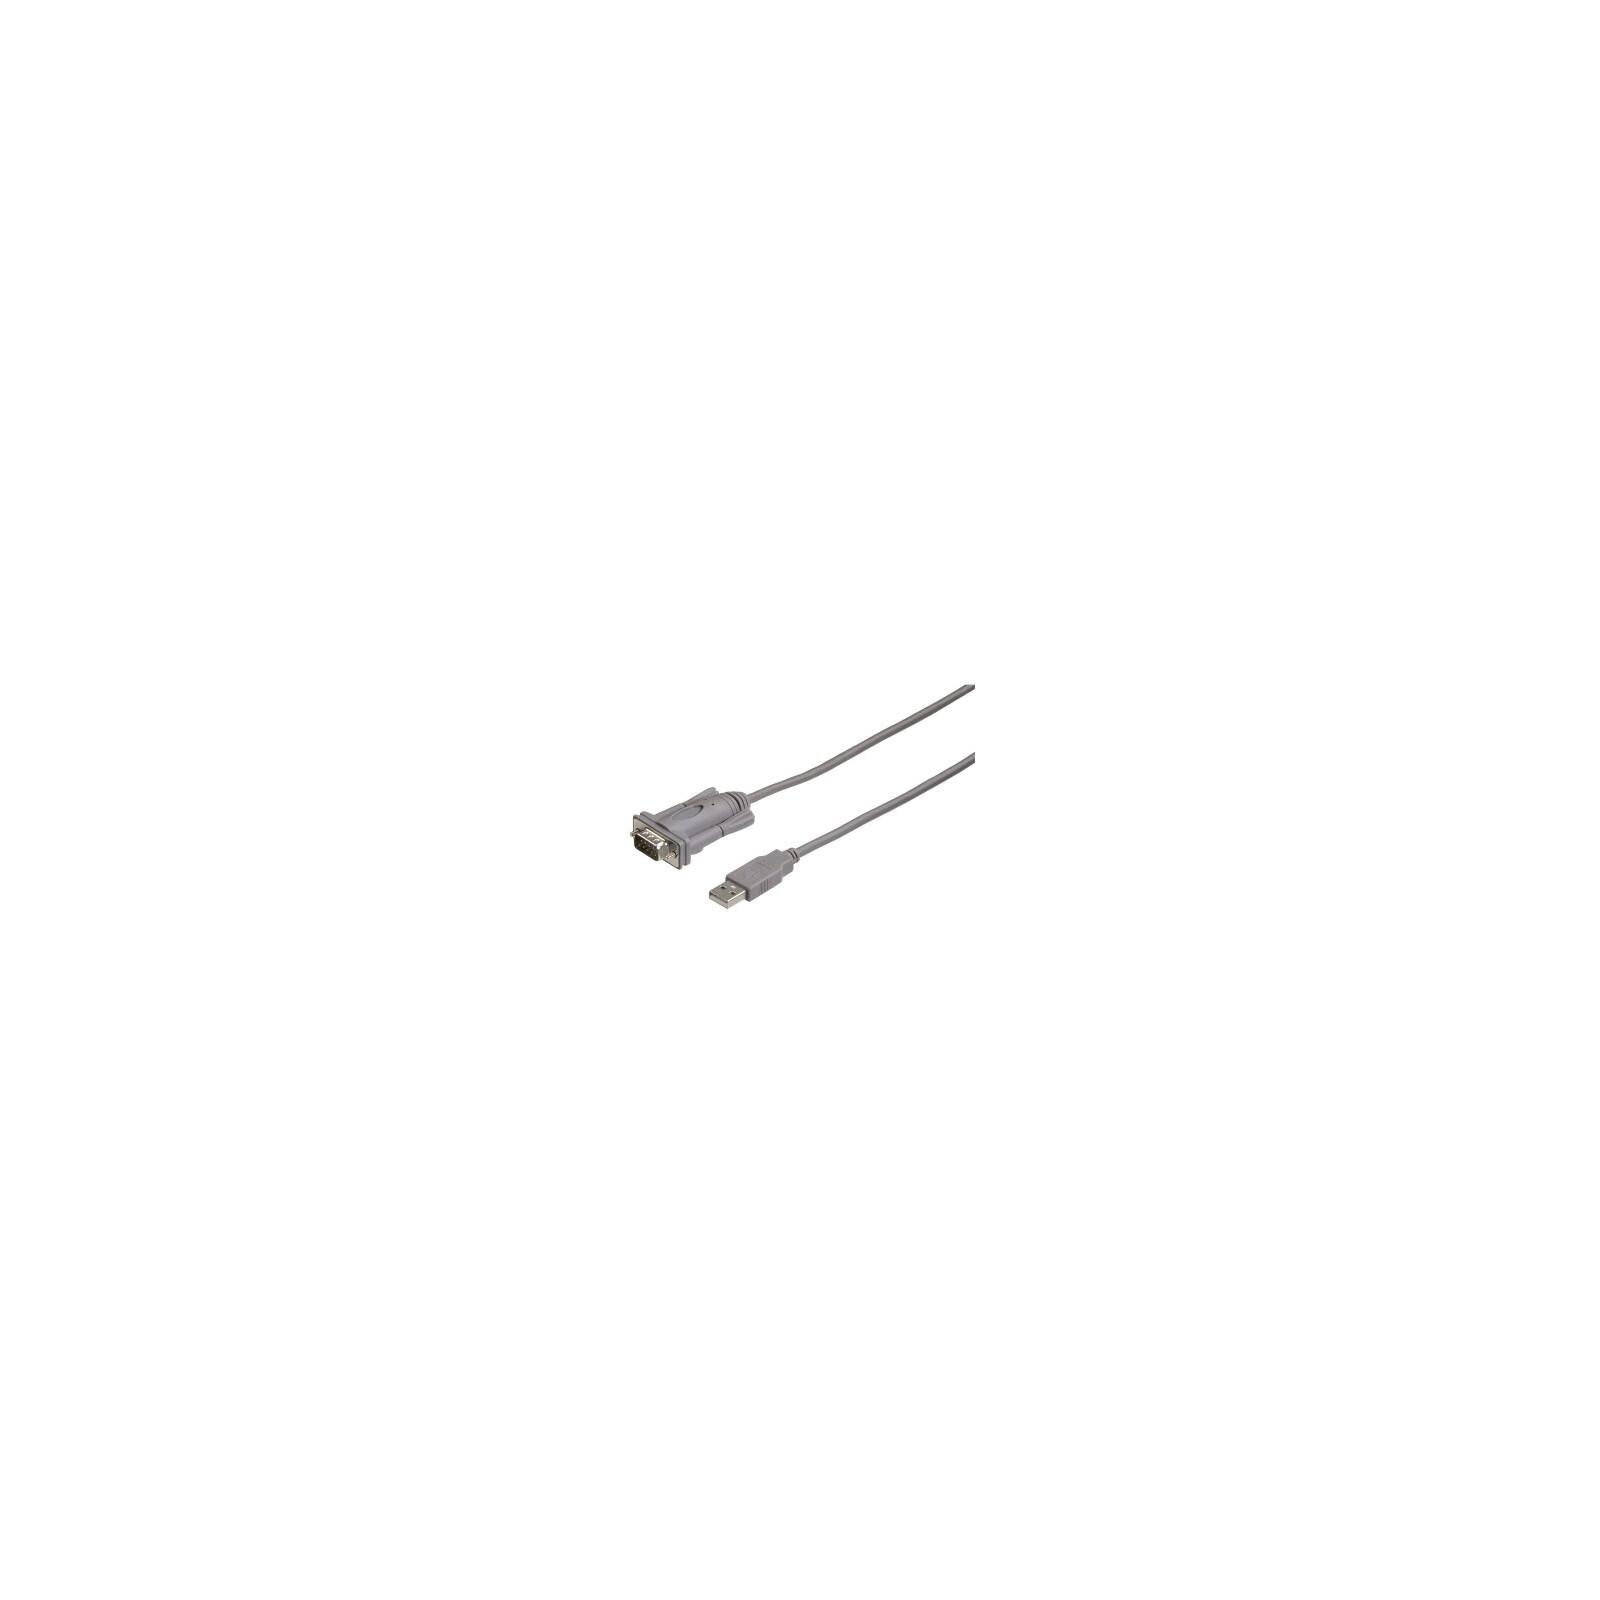 Hama 53325 USB zu Seriell Konverter